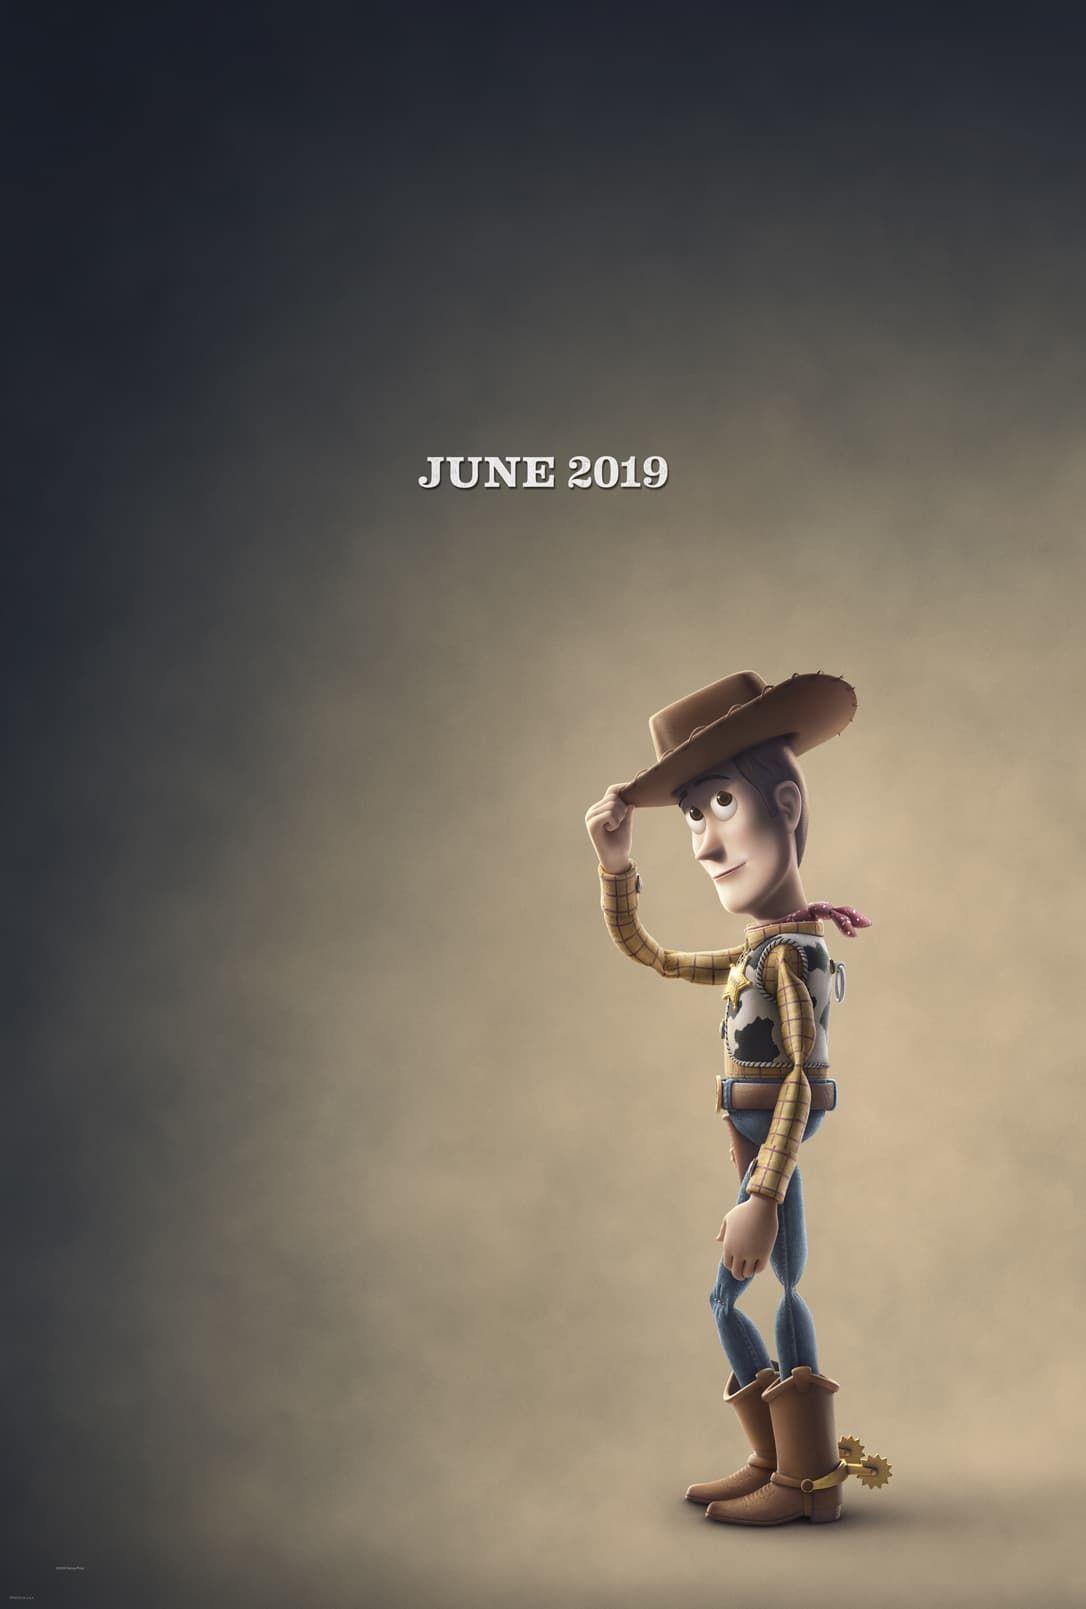 Ver   Toy Story 4 (2019) Pelicula Completa Online En Español Latino  Subtitulado 9b6afe7d6d6